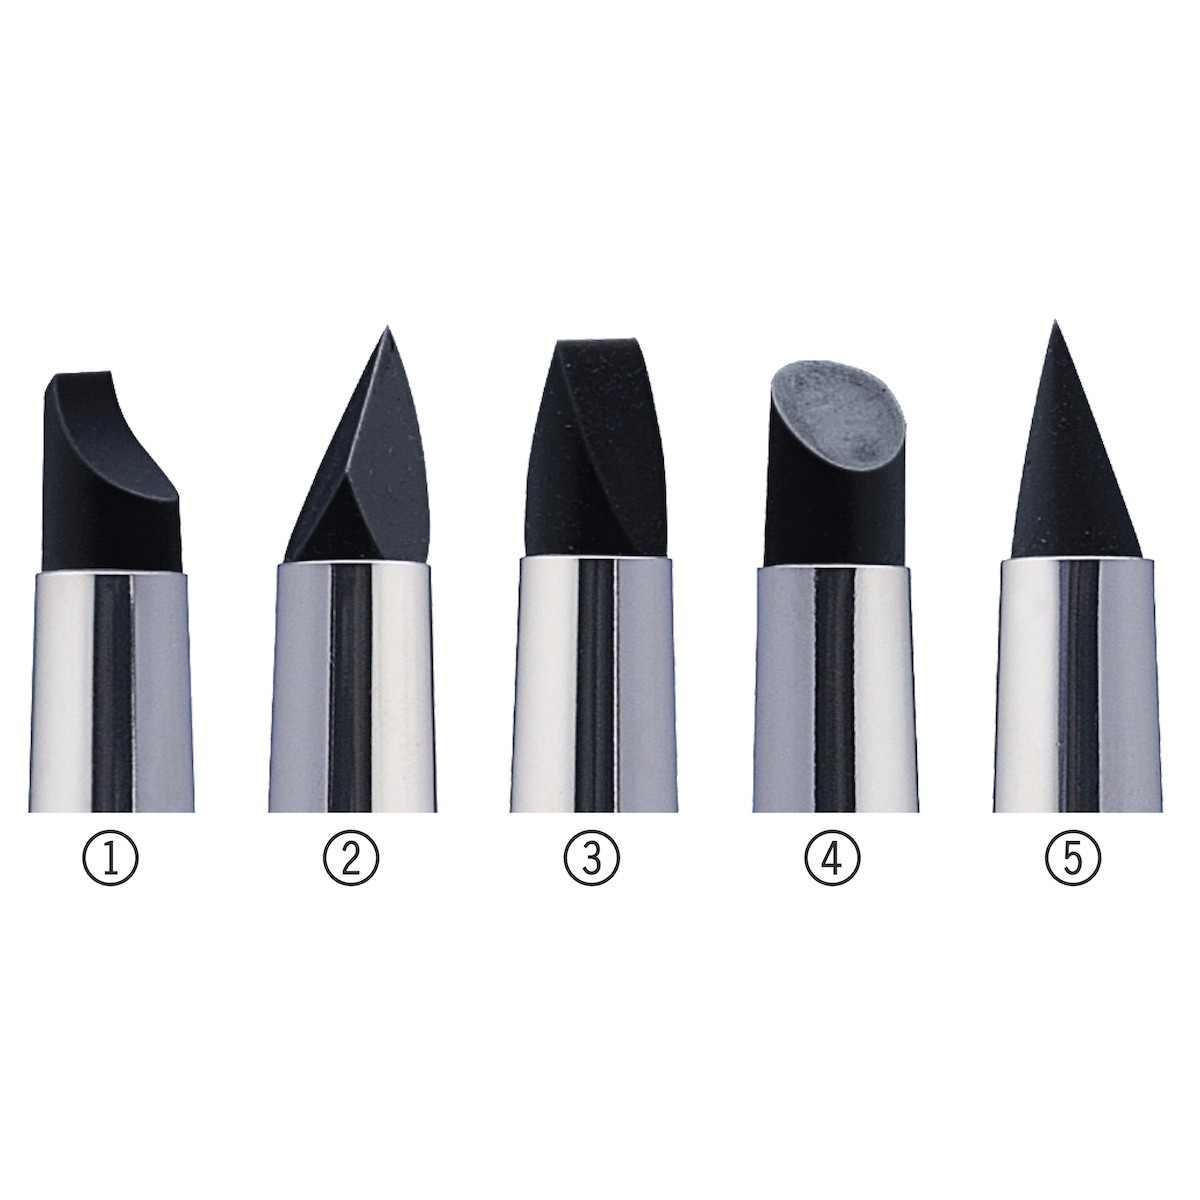 Colour Shaper, gummi, str. 10, 5 typer i pakke